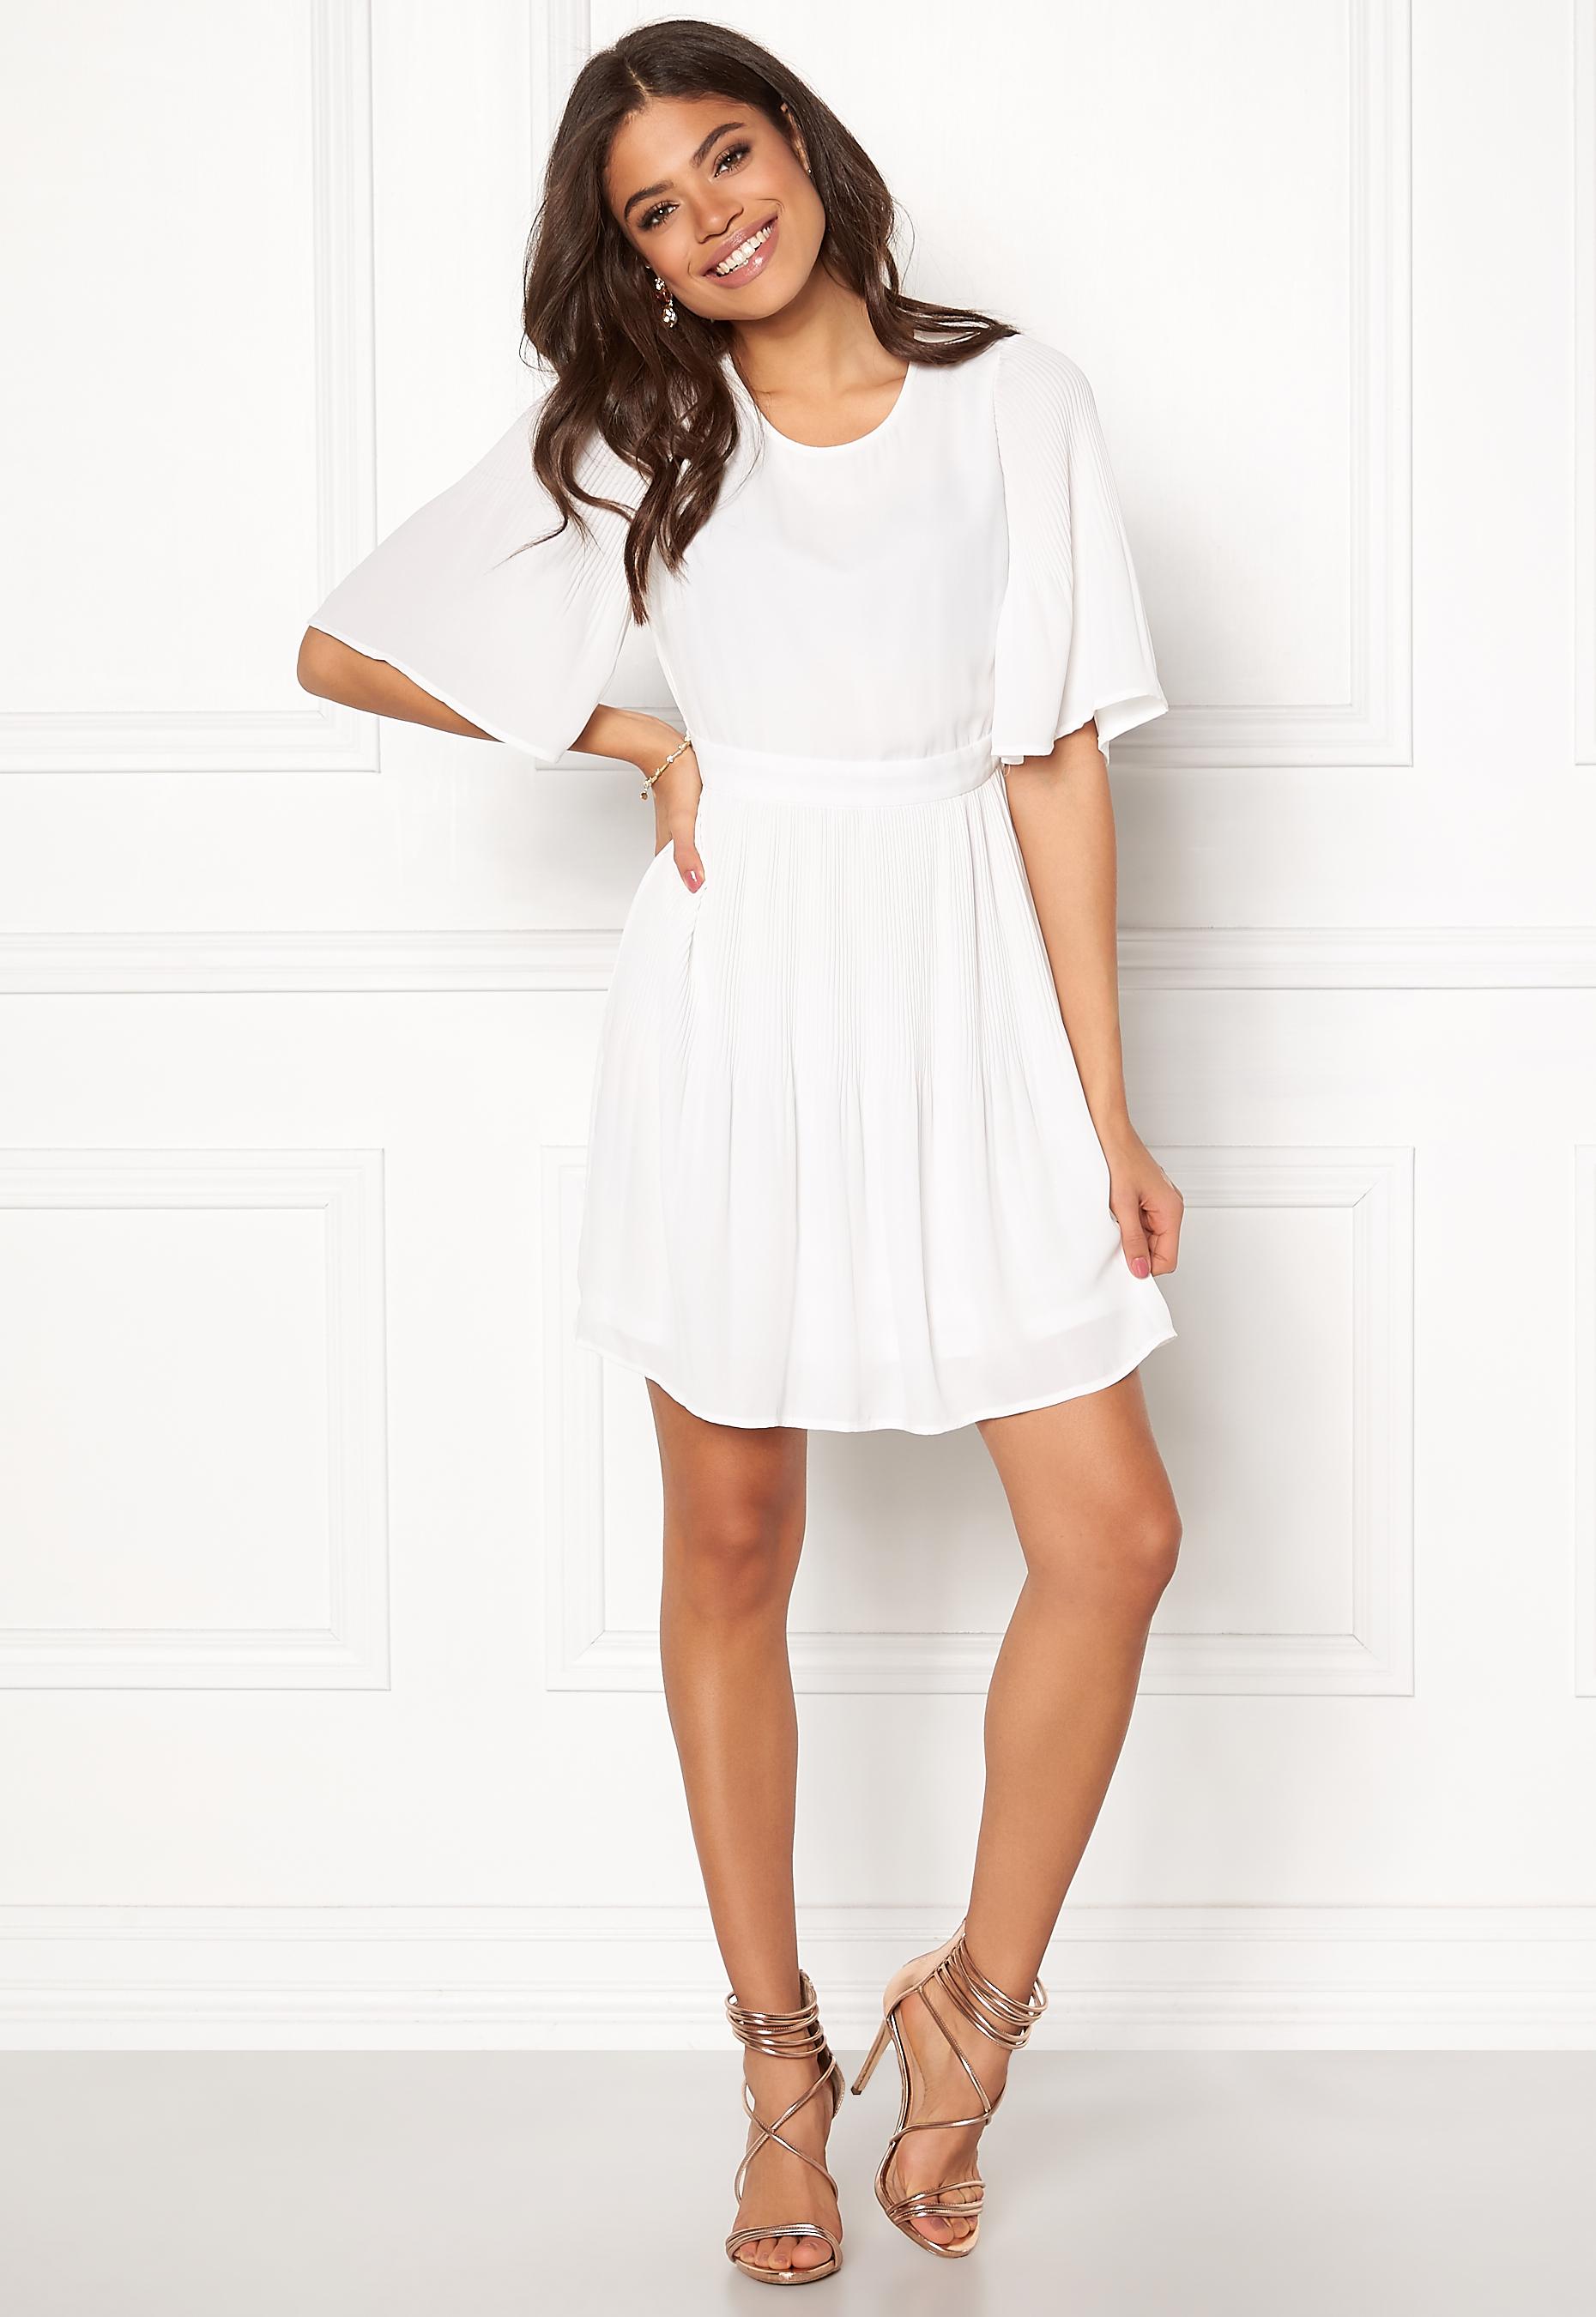 62416e674fc0 VERO MODA Amanda 2/4 Short Dress Snow White - Bubbleroom